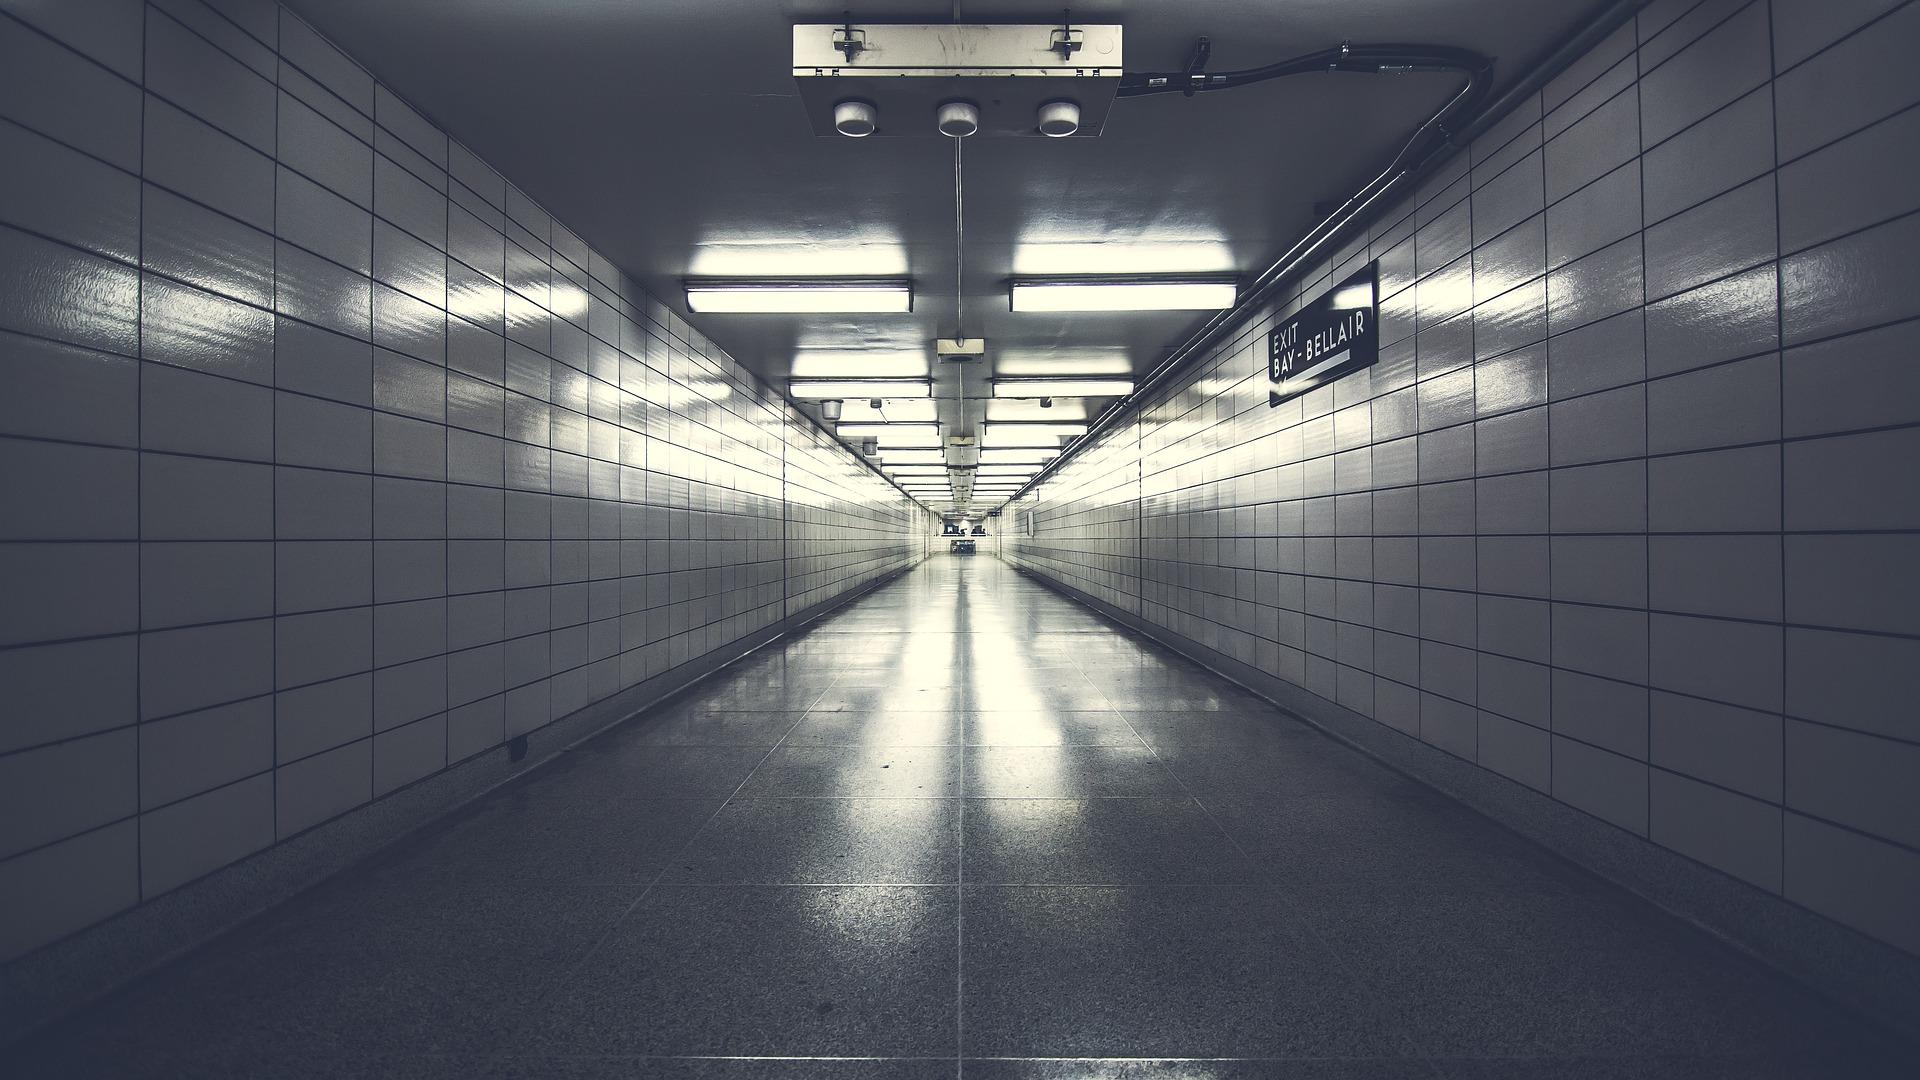 Between Two Worlds In The Interdimensional Hallway